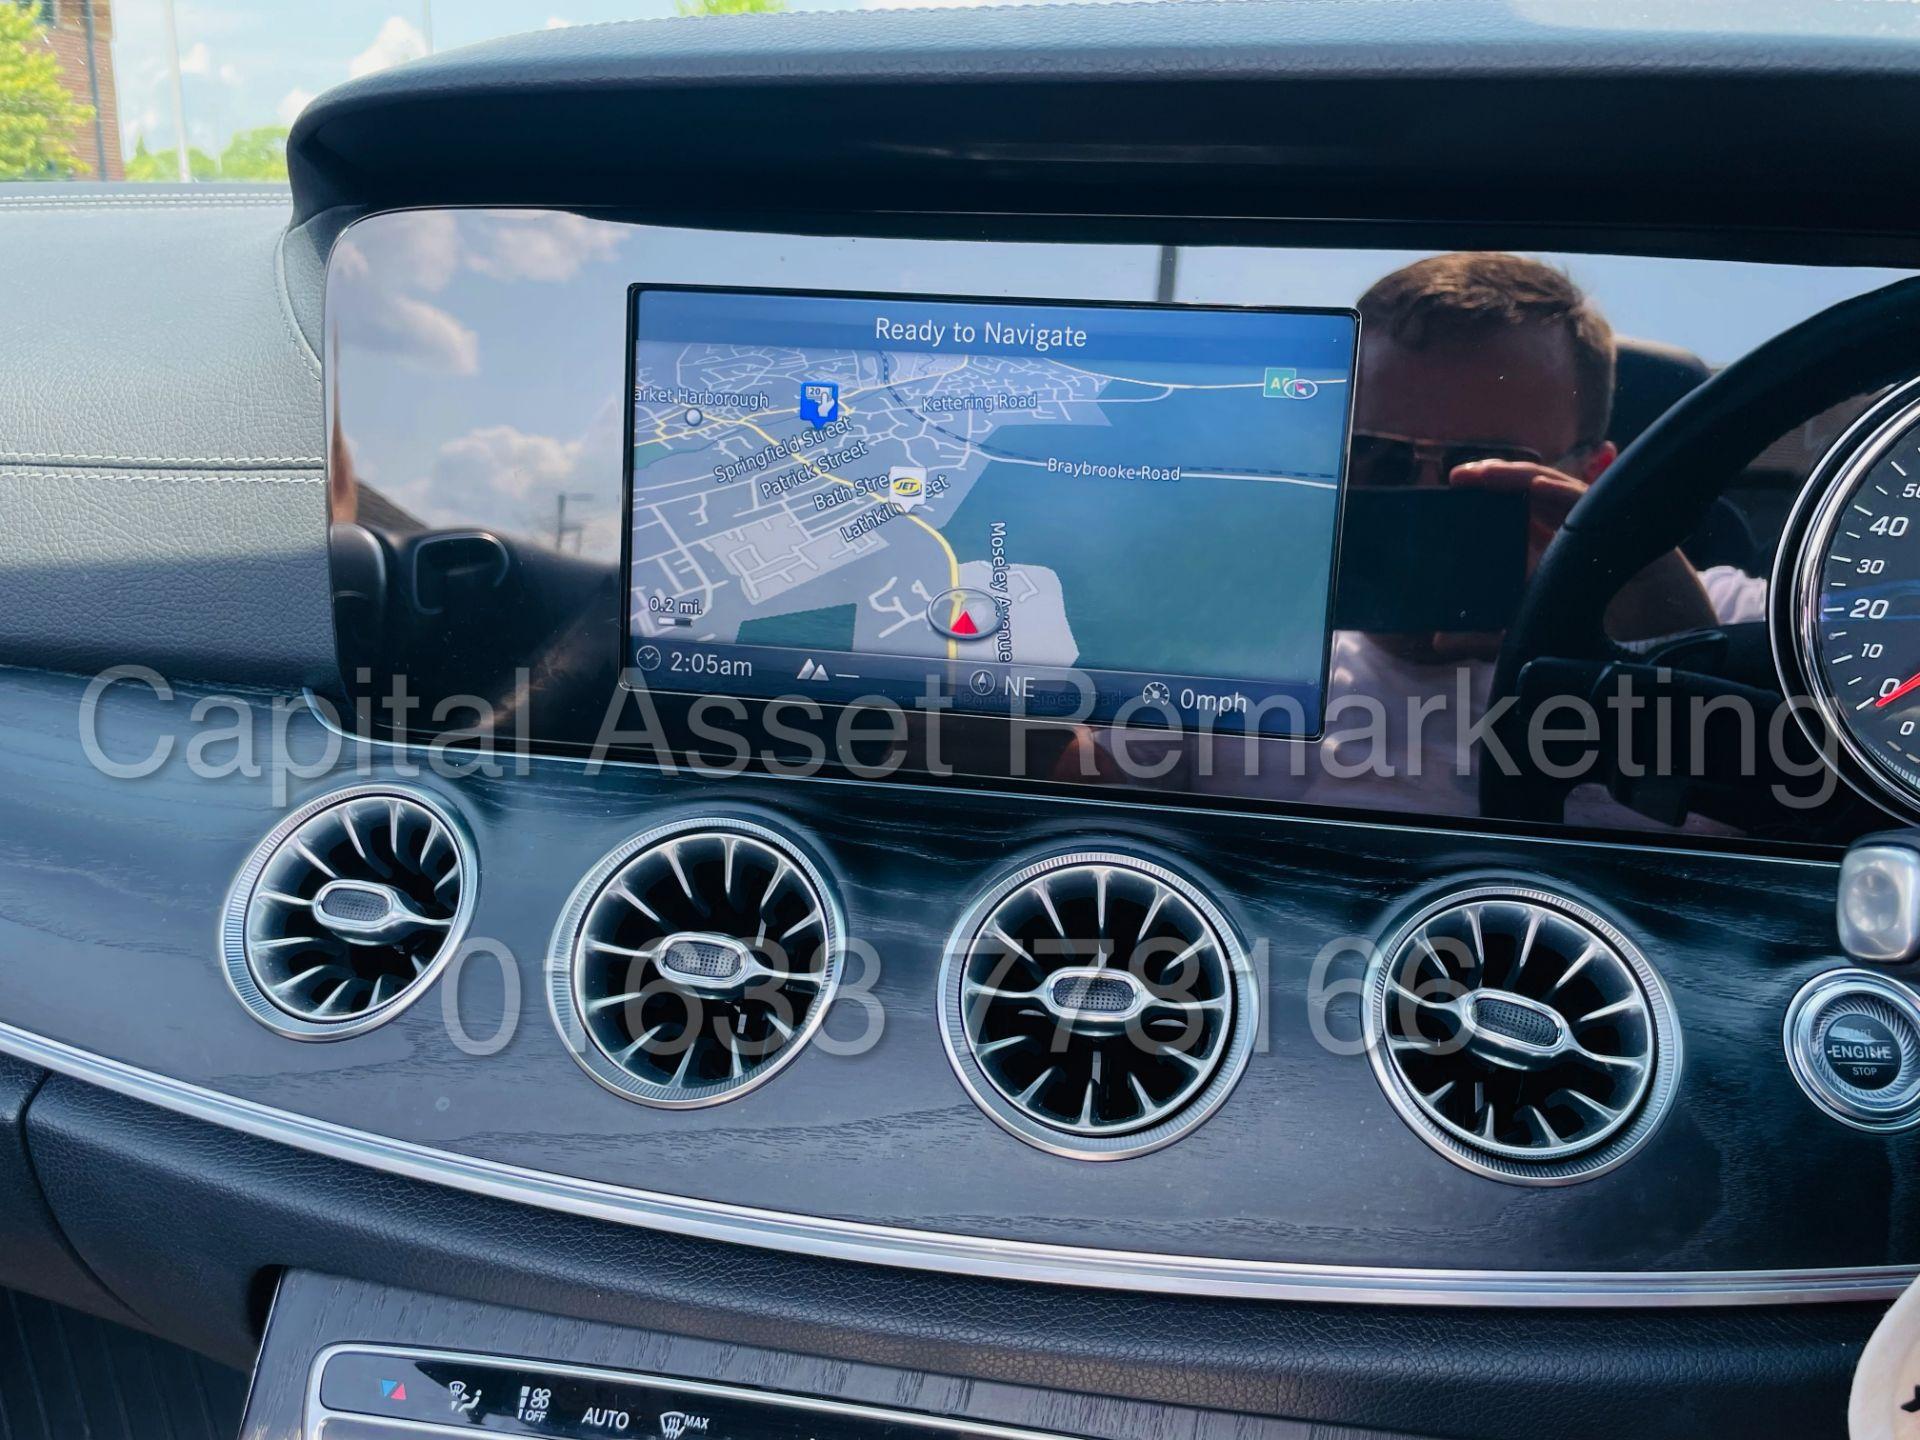 MERCEDES-BENZ E220d *AMG LINE PREMIUM - CABRIOLET* (2018 - EURO 6) '9G AUTO - LEATHER - SAT NAV' - Image 55 of 63